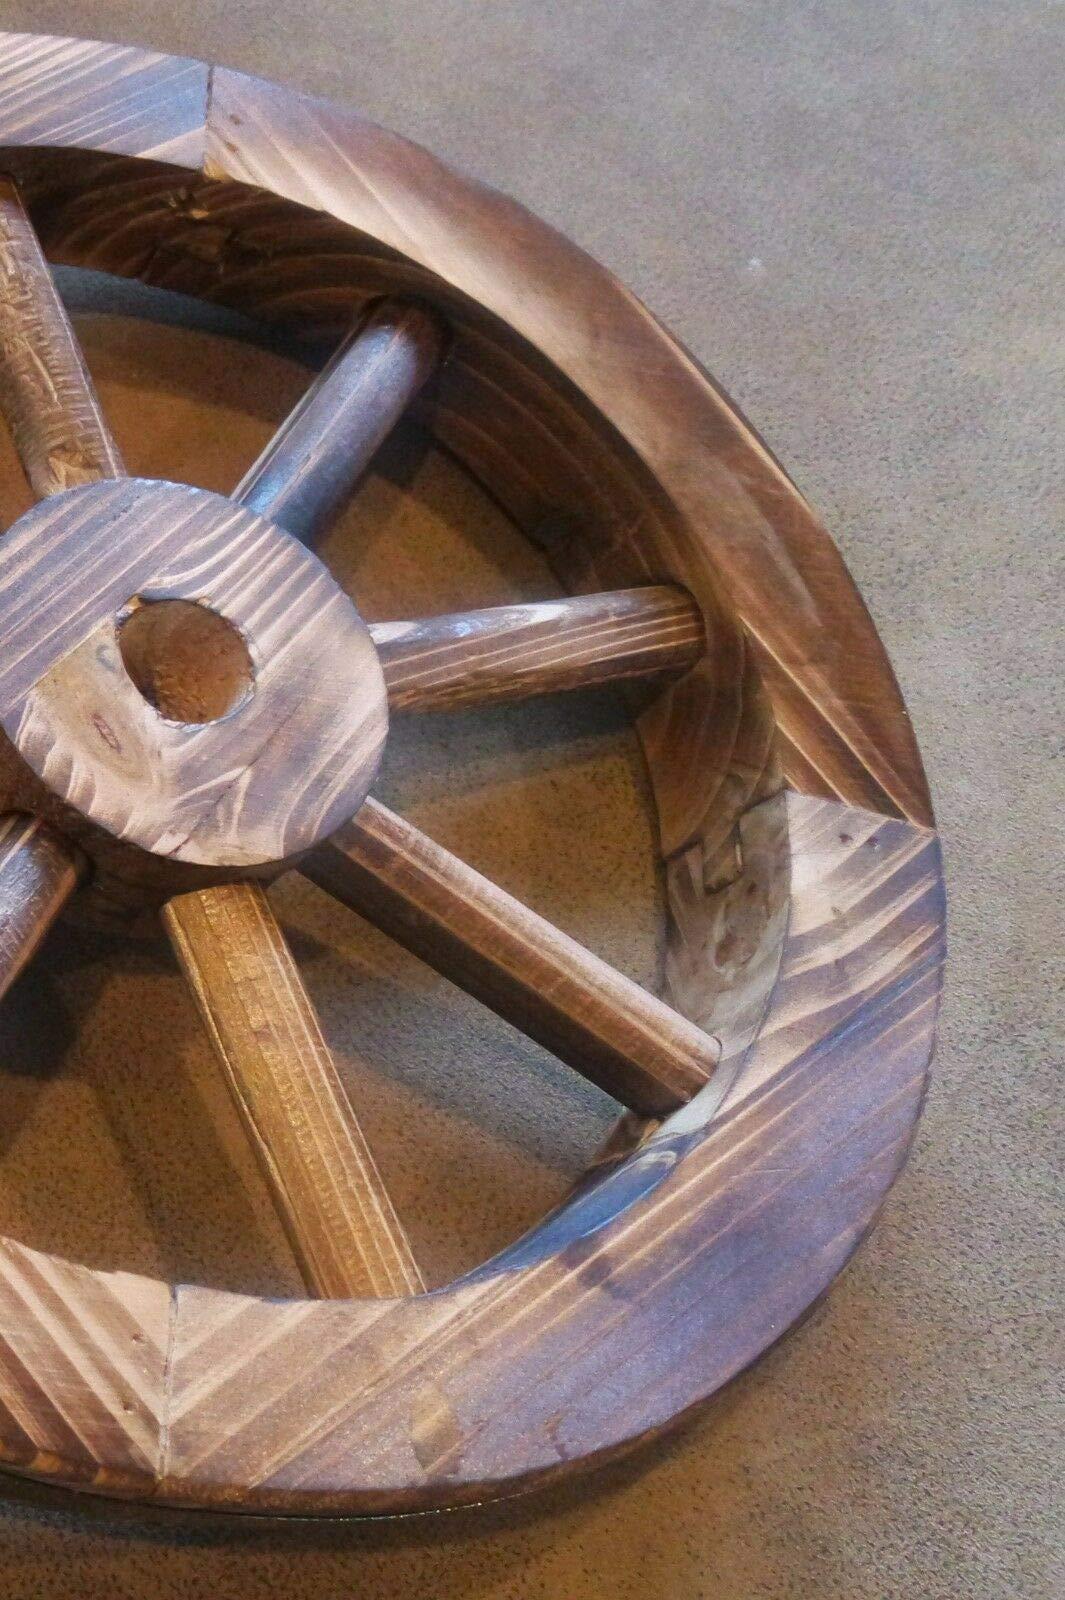 Galapagoz Wooden Wagon Wheels Burnt Wood Wheel Look Garden Decor Table Centerpiece Decorative 12'' 2 Pack US by Galapagoz (Image #7)